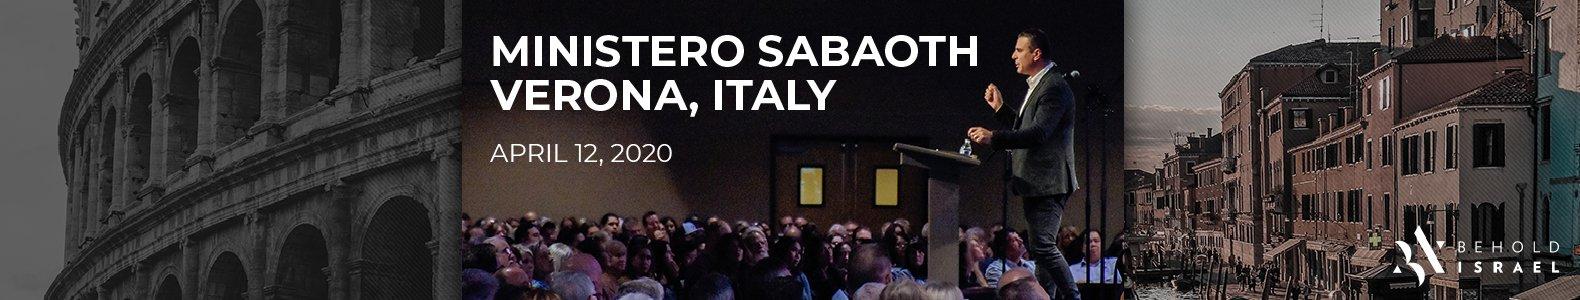 Ministero Sabaoth Verona 2020